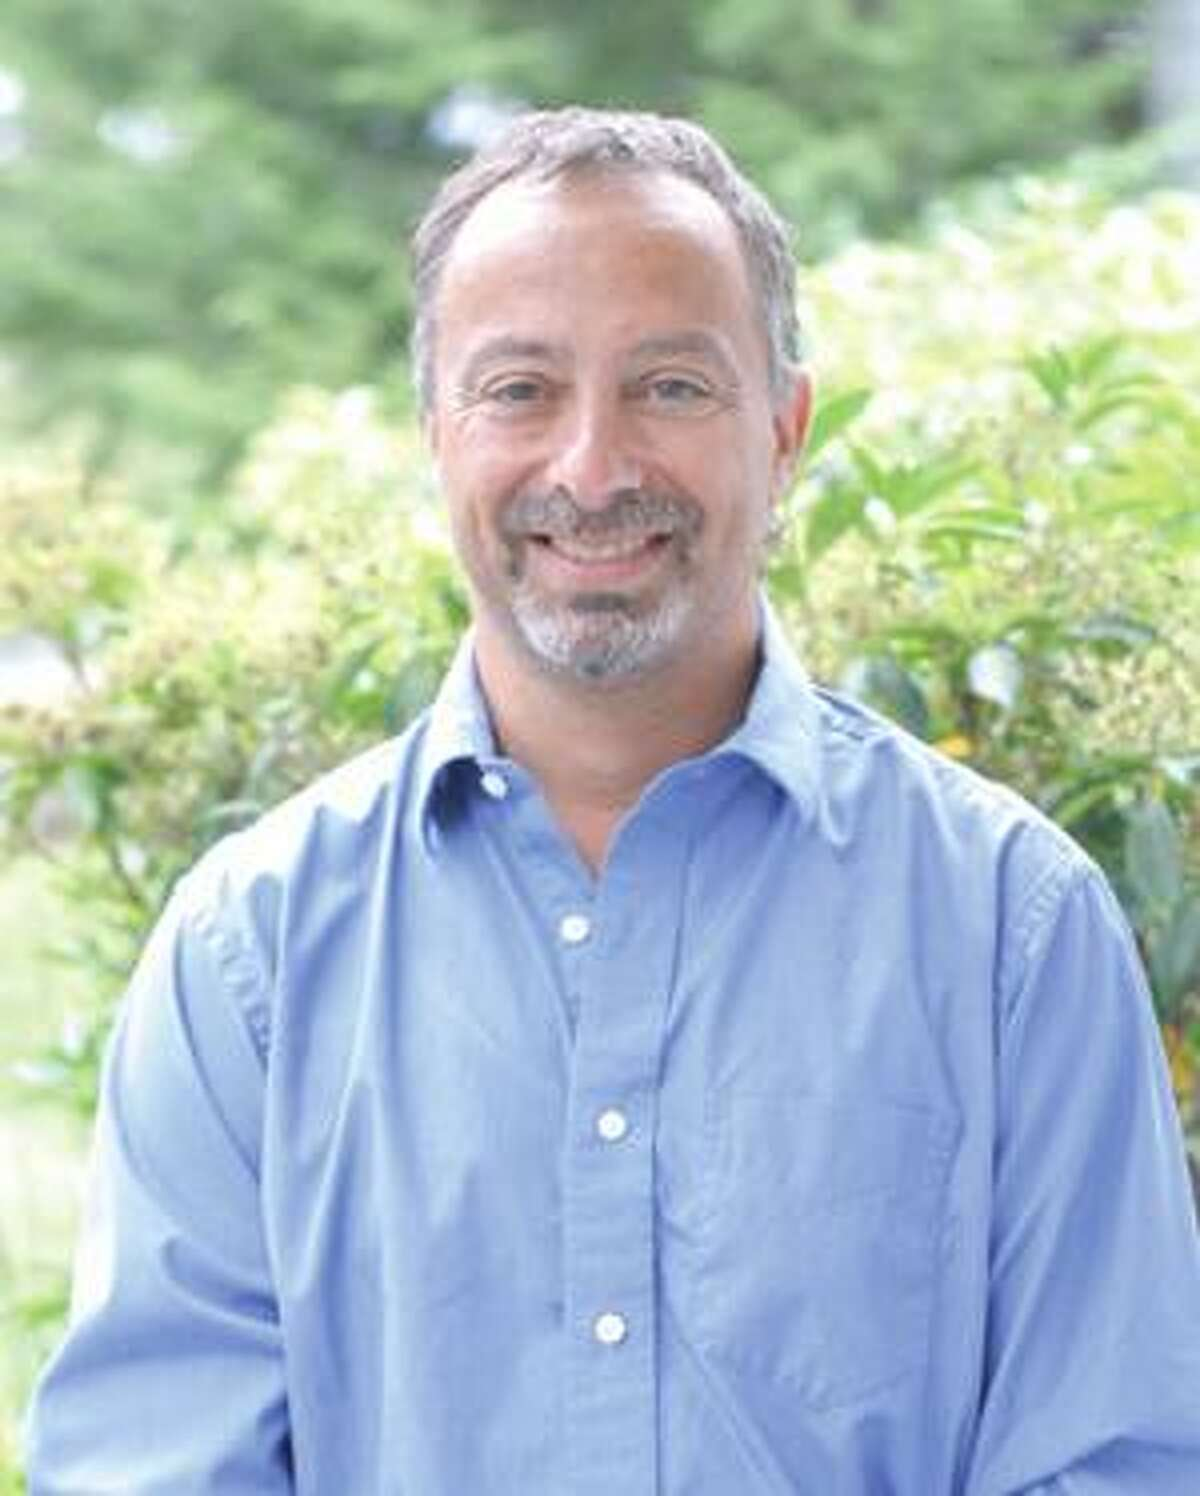 MIC NICOSIA/Register Citizen Mario Longobucco is the new Torrington High School girls soccer coach.